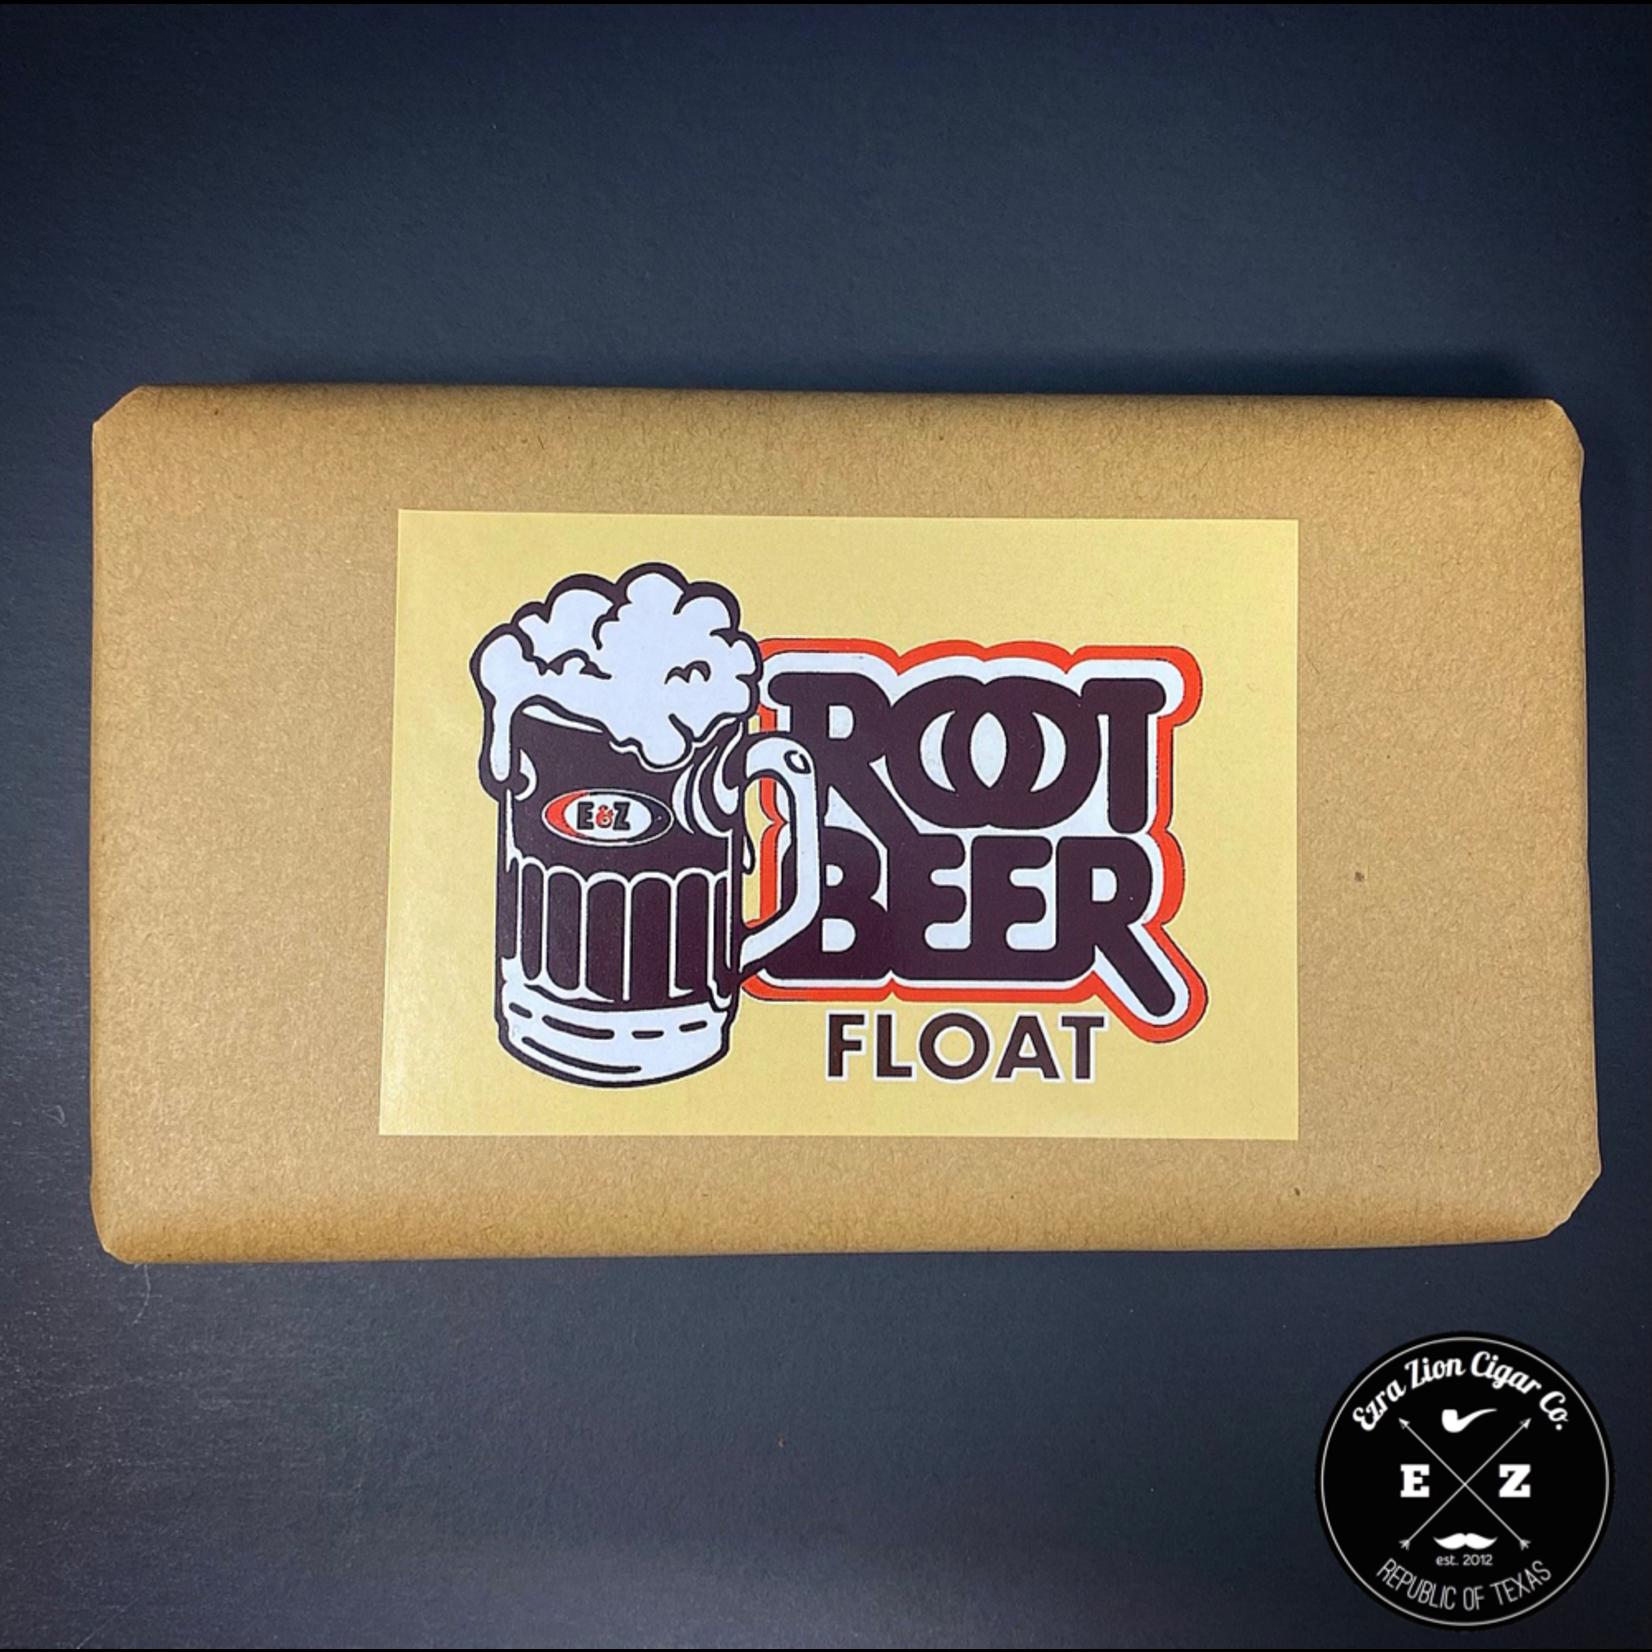 Ezra Zion Cigars Root Beer Float (Boozy Edition)